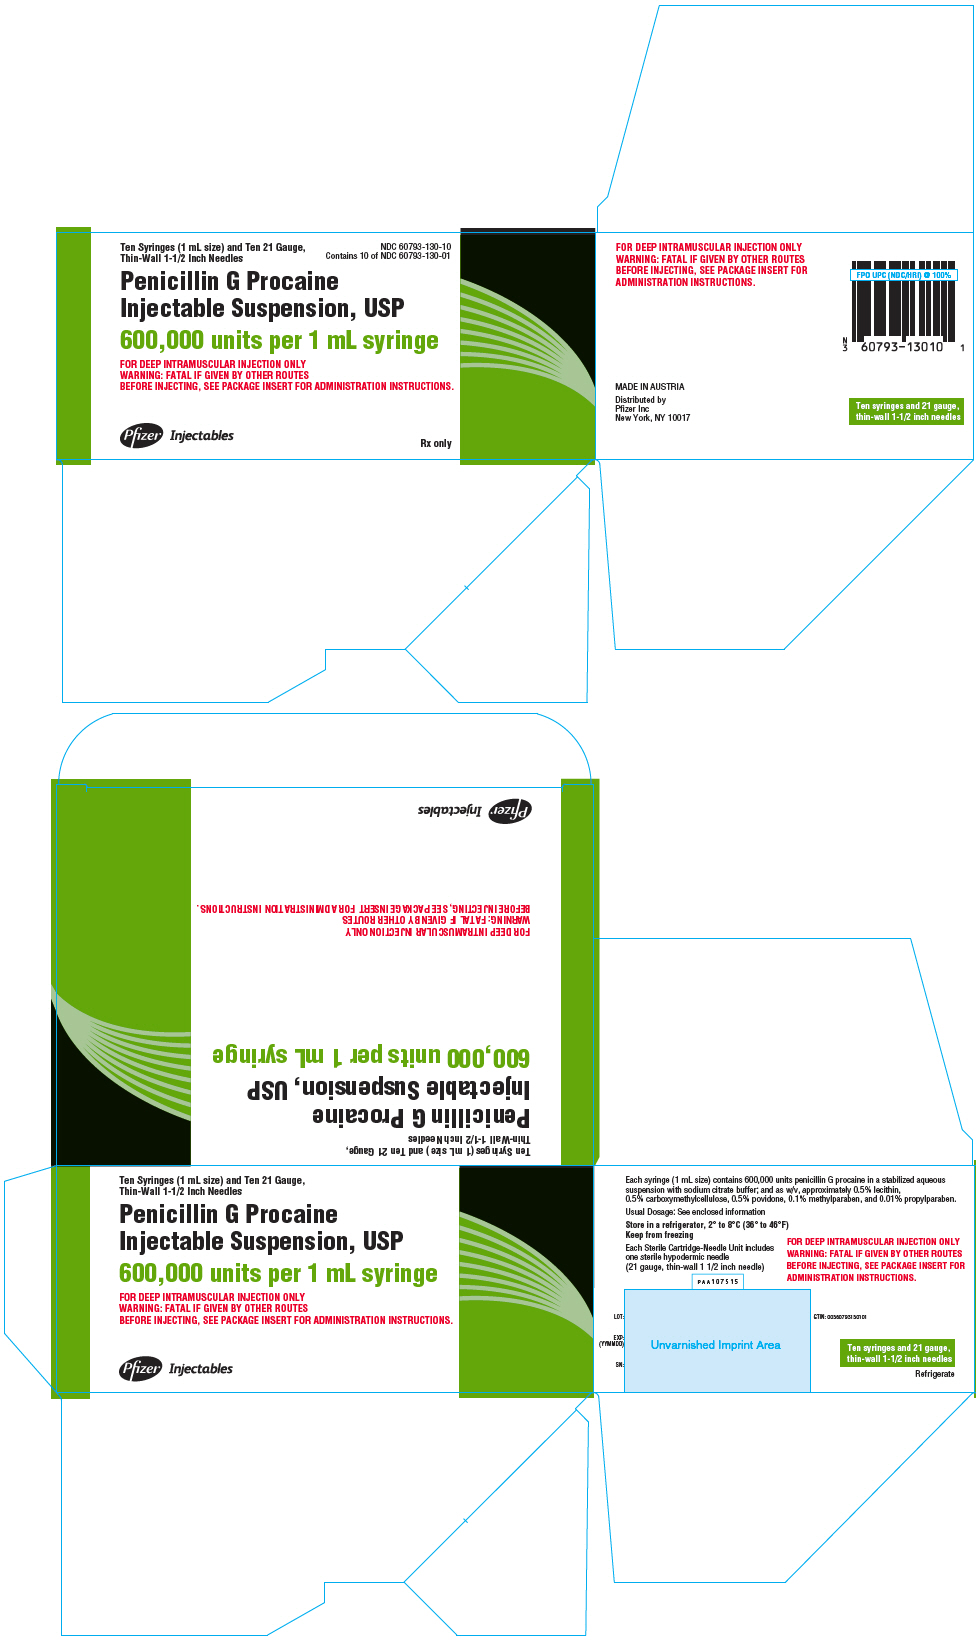 PRINCIPAL DISPLAY PANEL - 1 mL Syringe Package